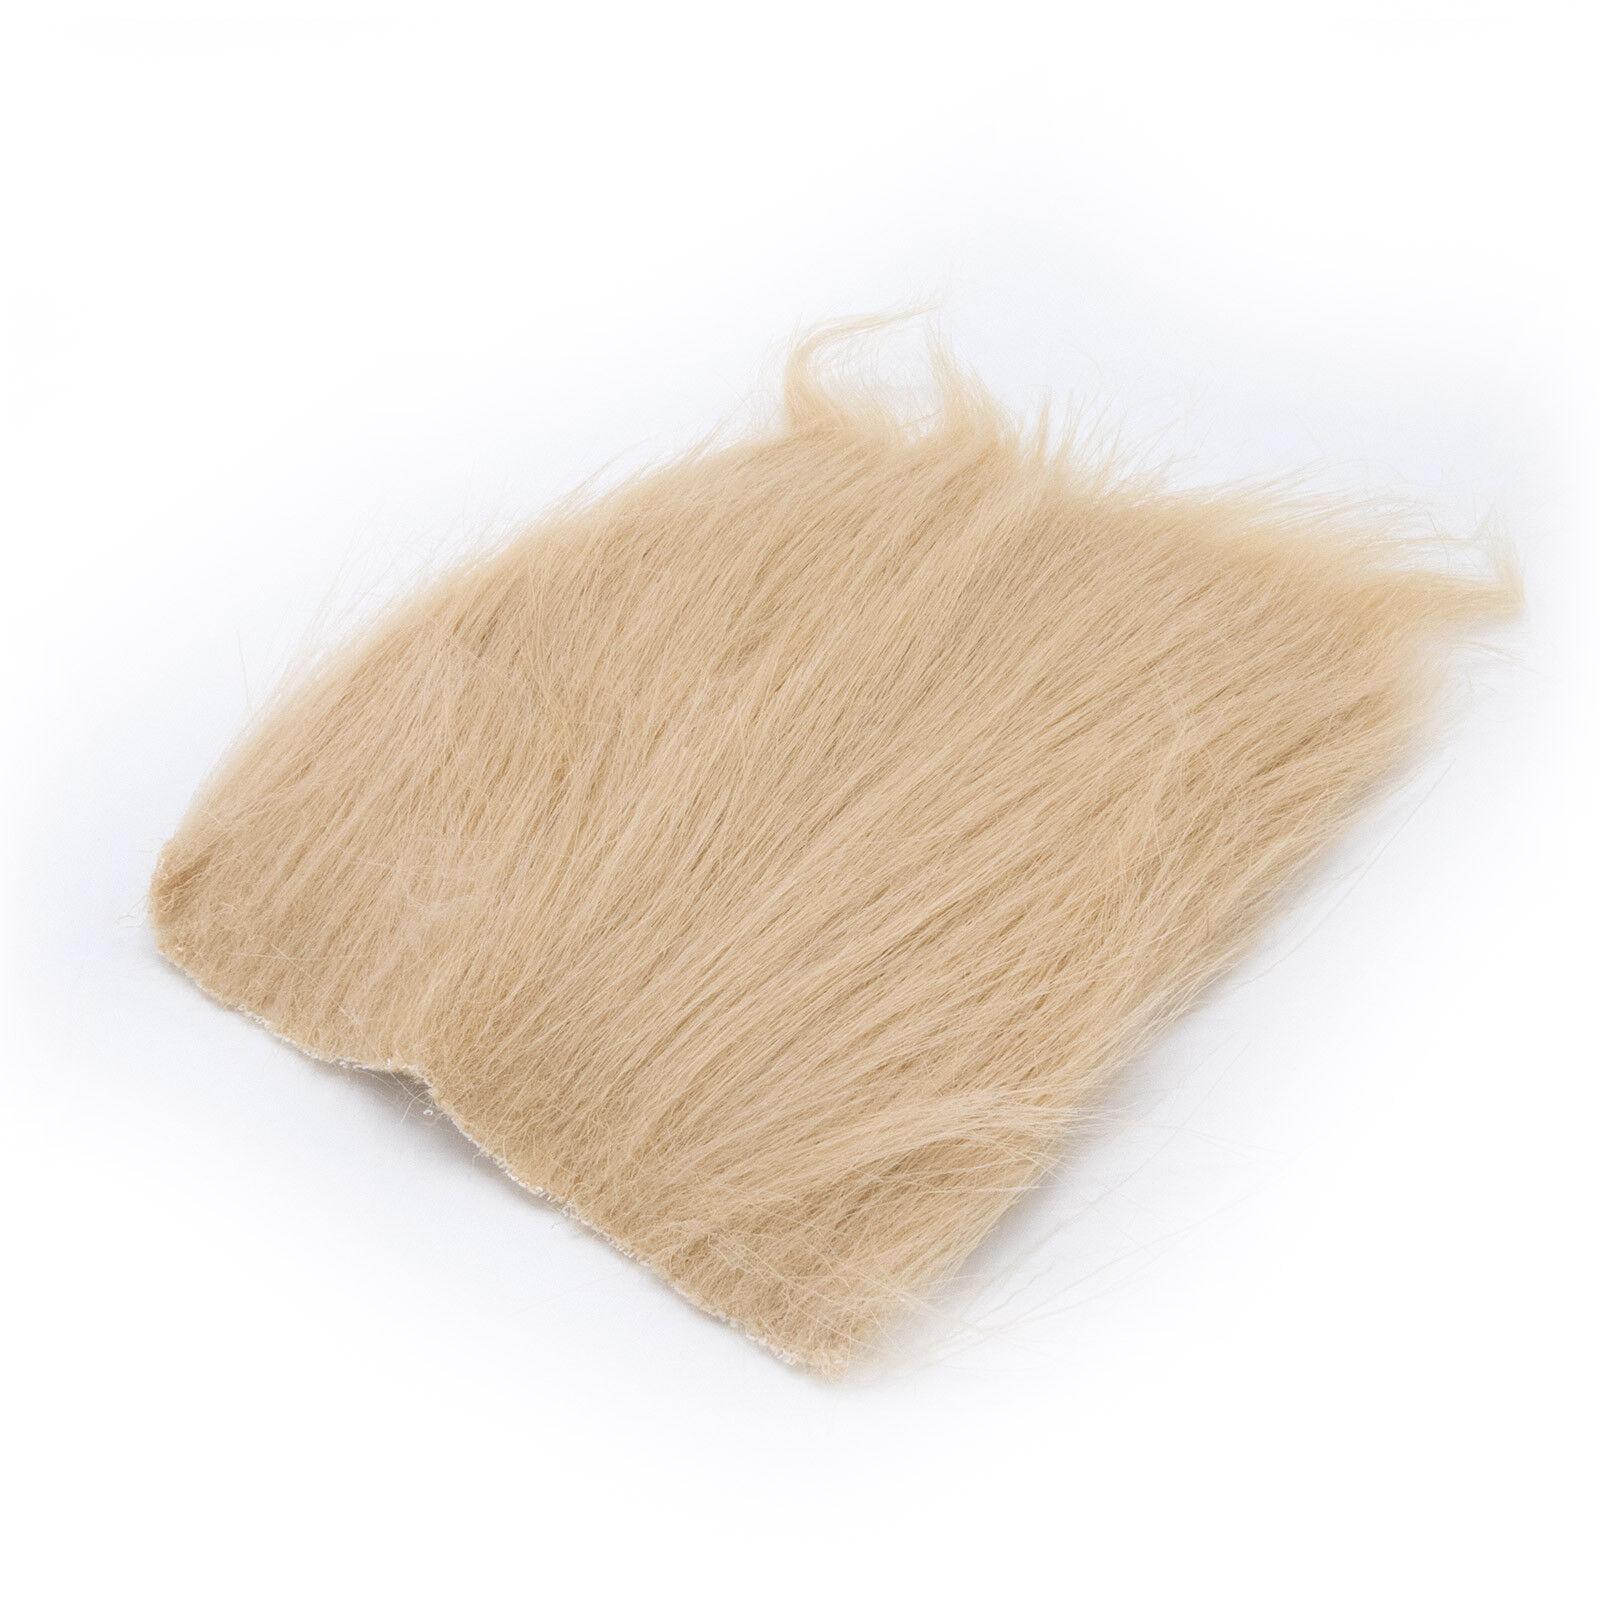 Bait Binding Material Haired Artificial Craft Fur Fluffy Tying Jig Supplies Hot